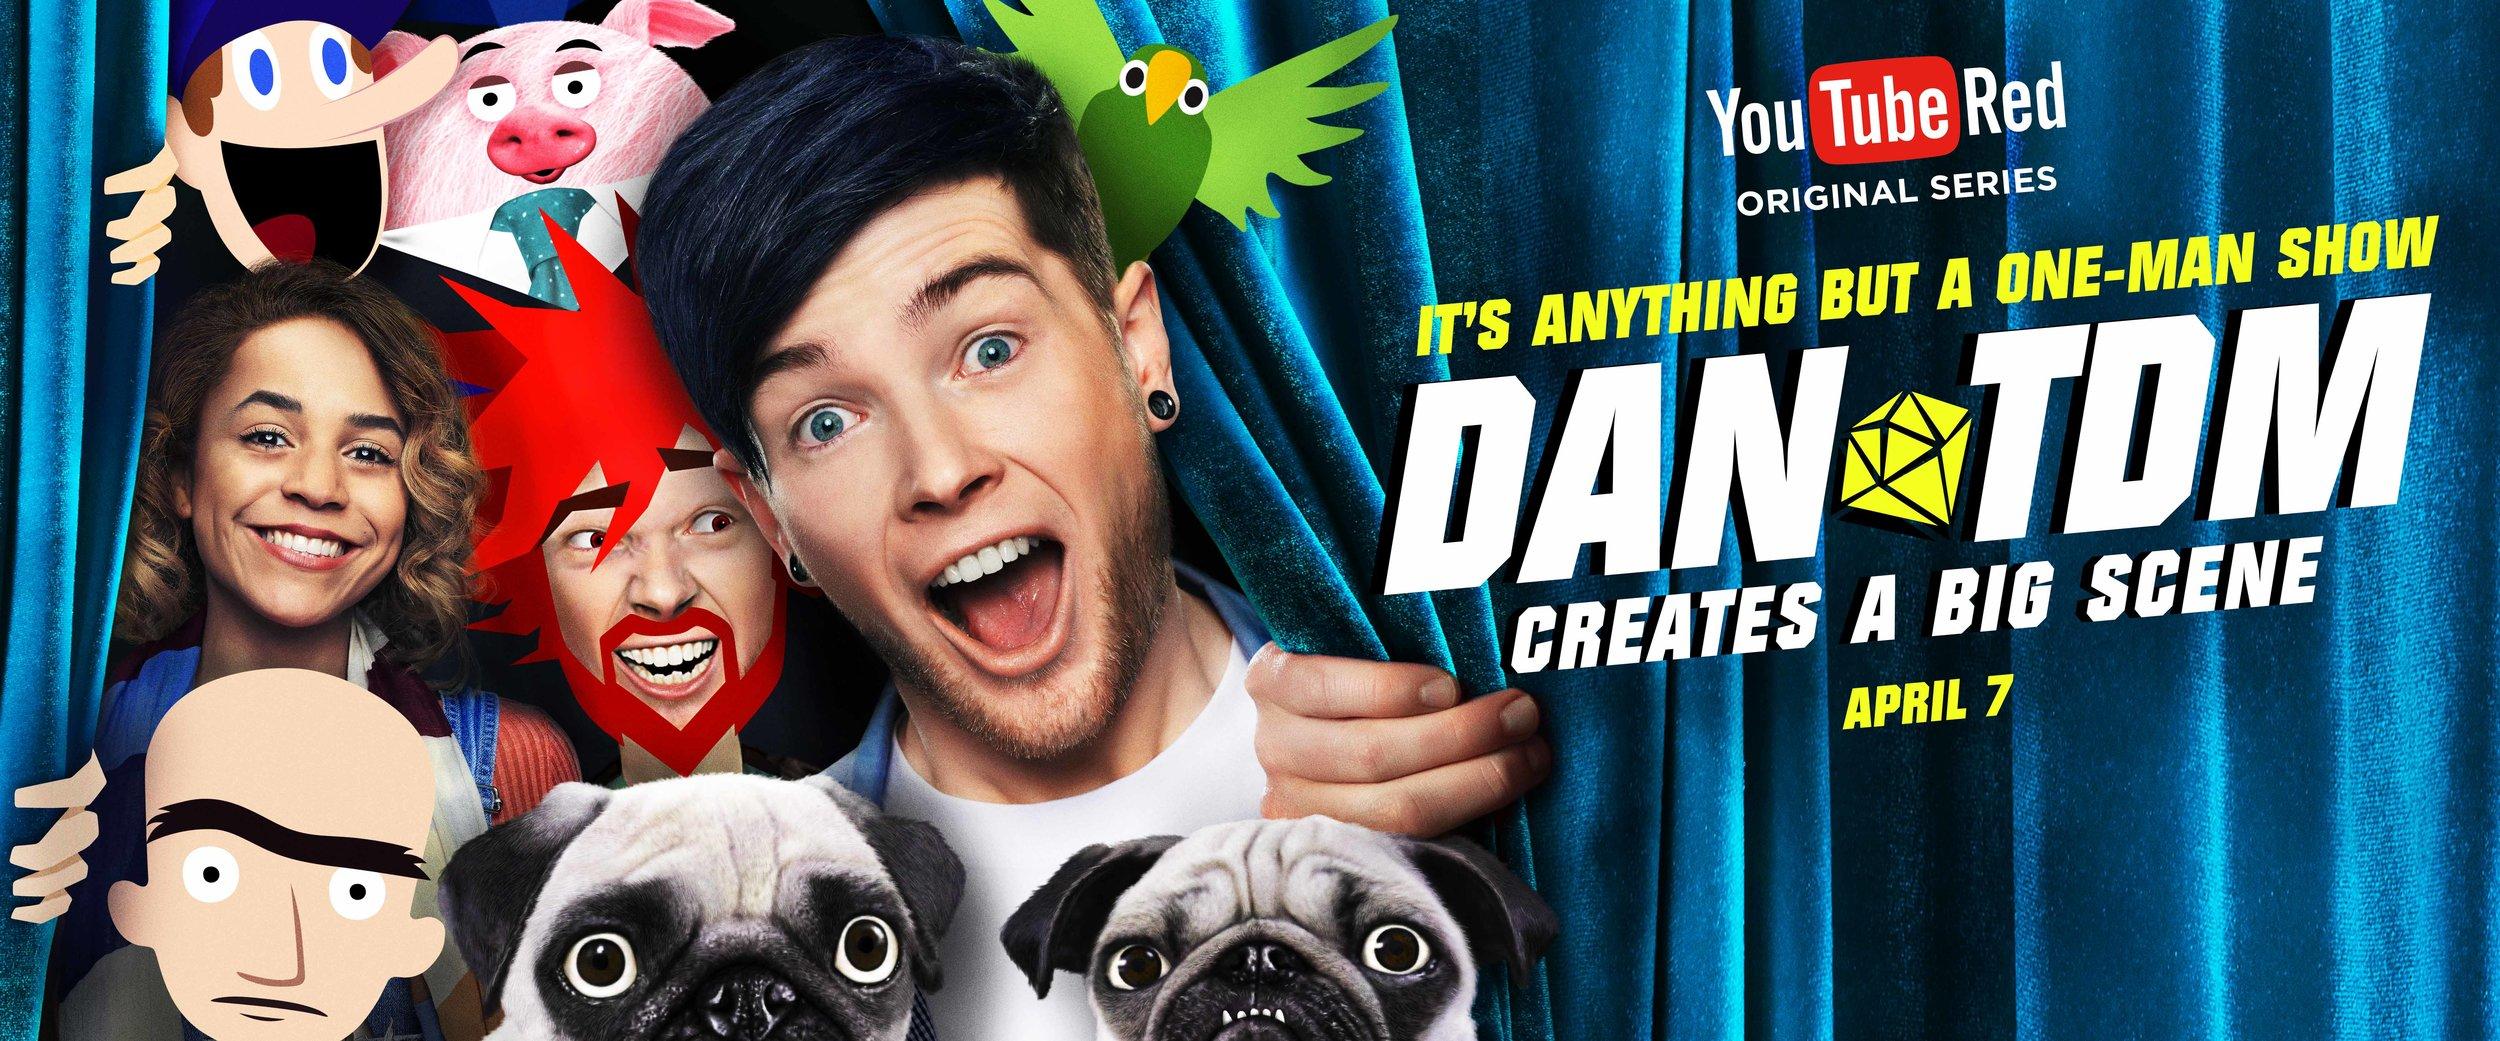 Dan TDM Creates a Big Scene   only on Youtube Red Original Series!